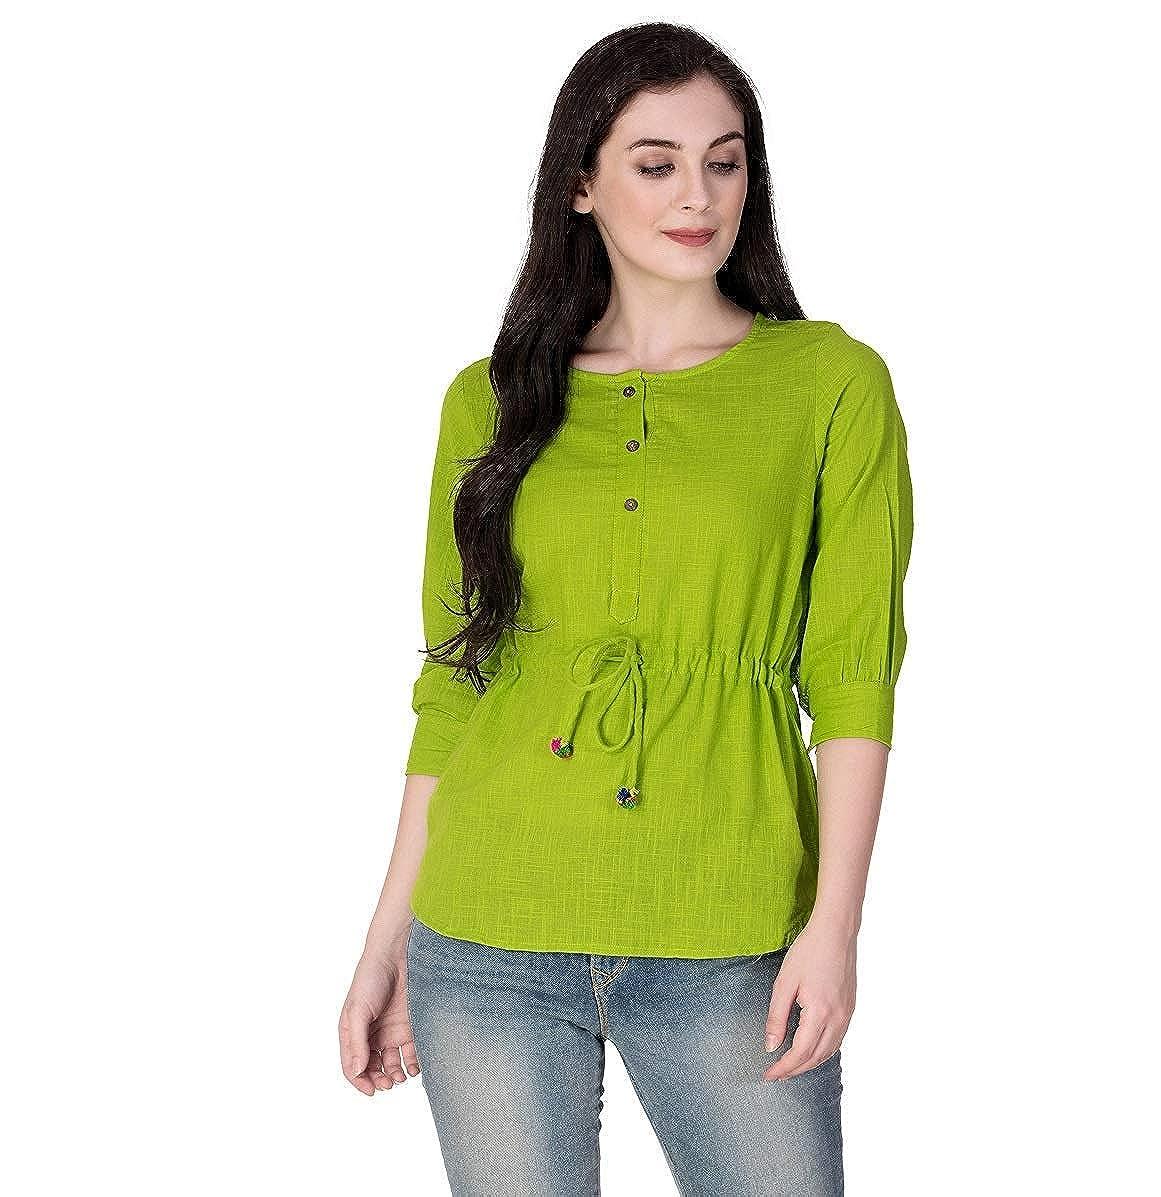 SCION Women's Beautiful Designer Green Cotton slub top for Women